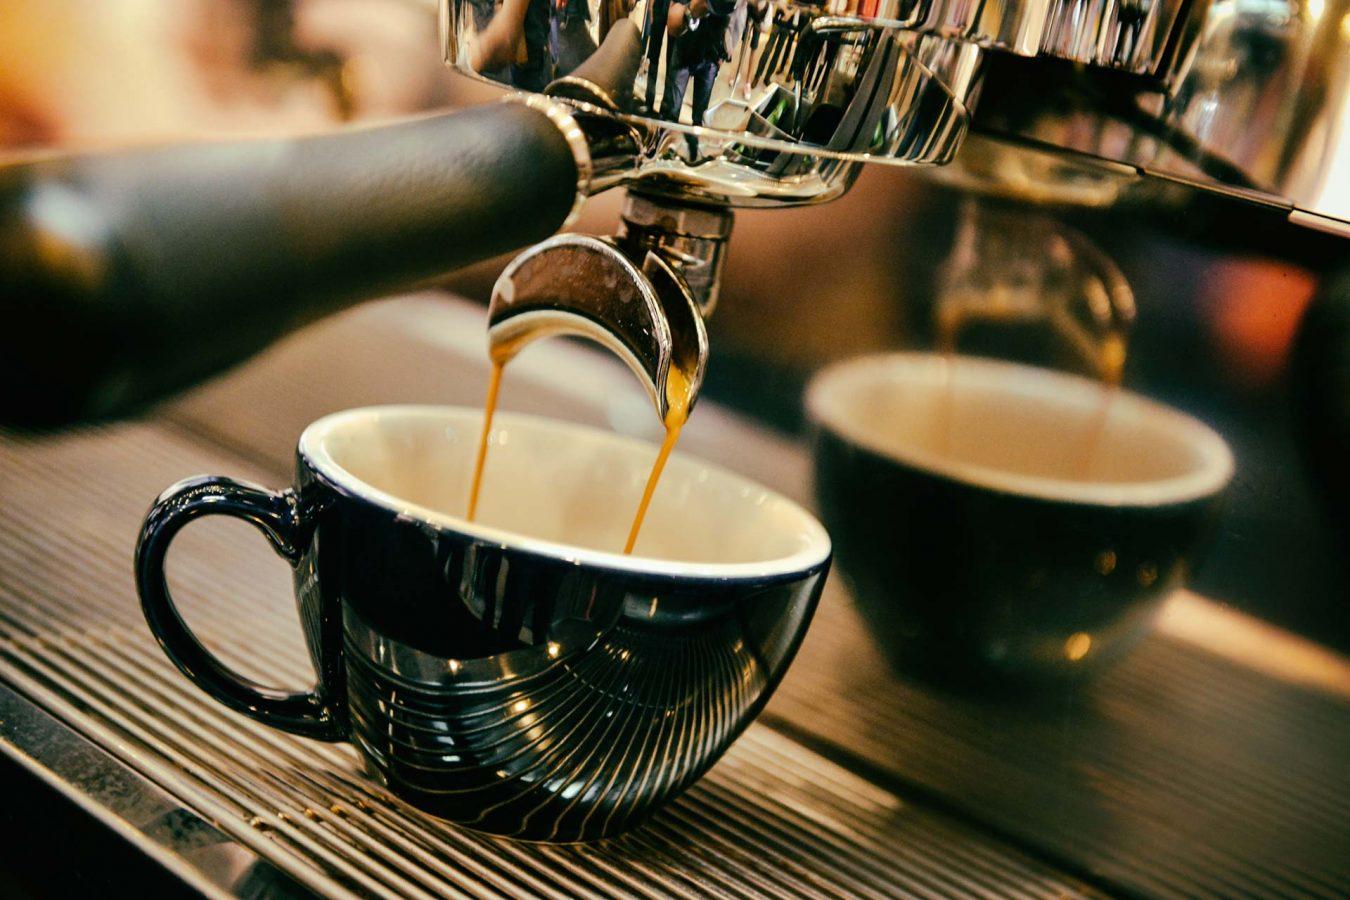 bigstock-Espresso-Shot-From-Coffee-Mach-259411261